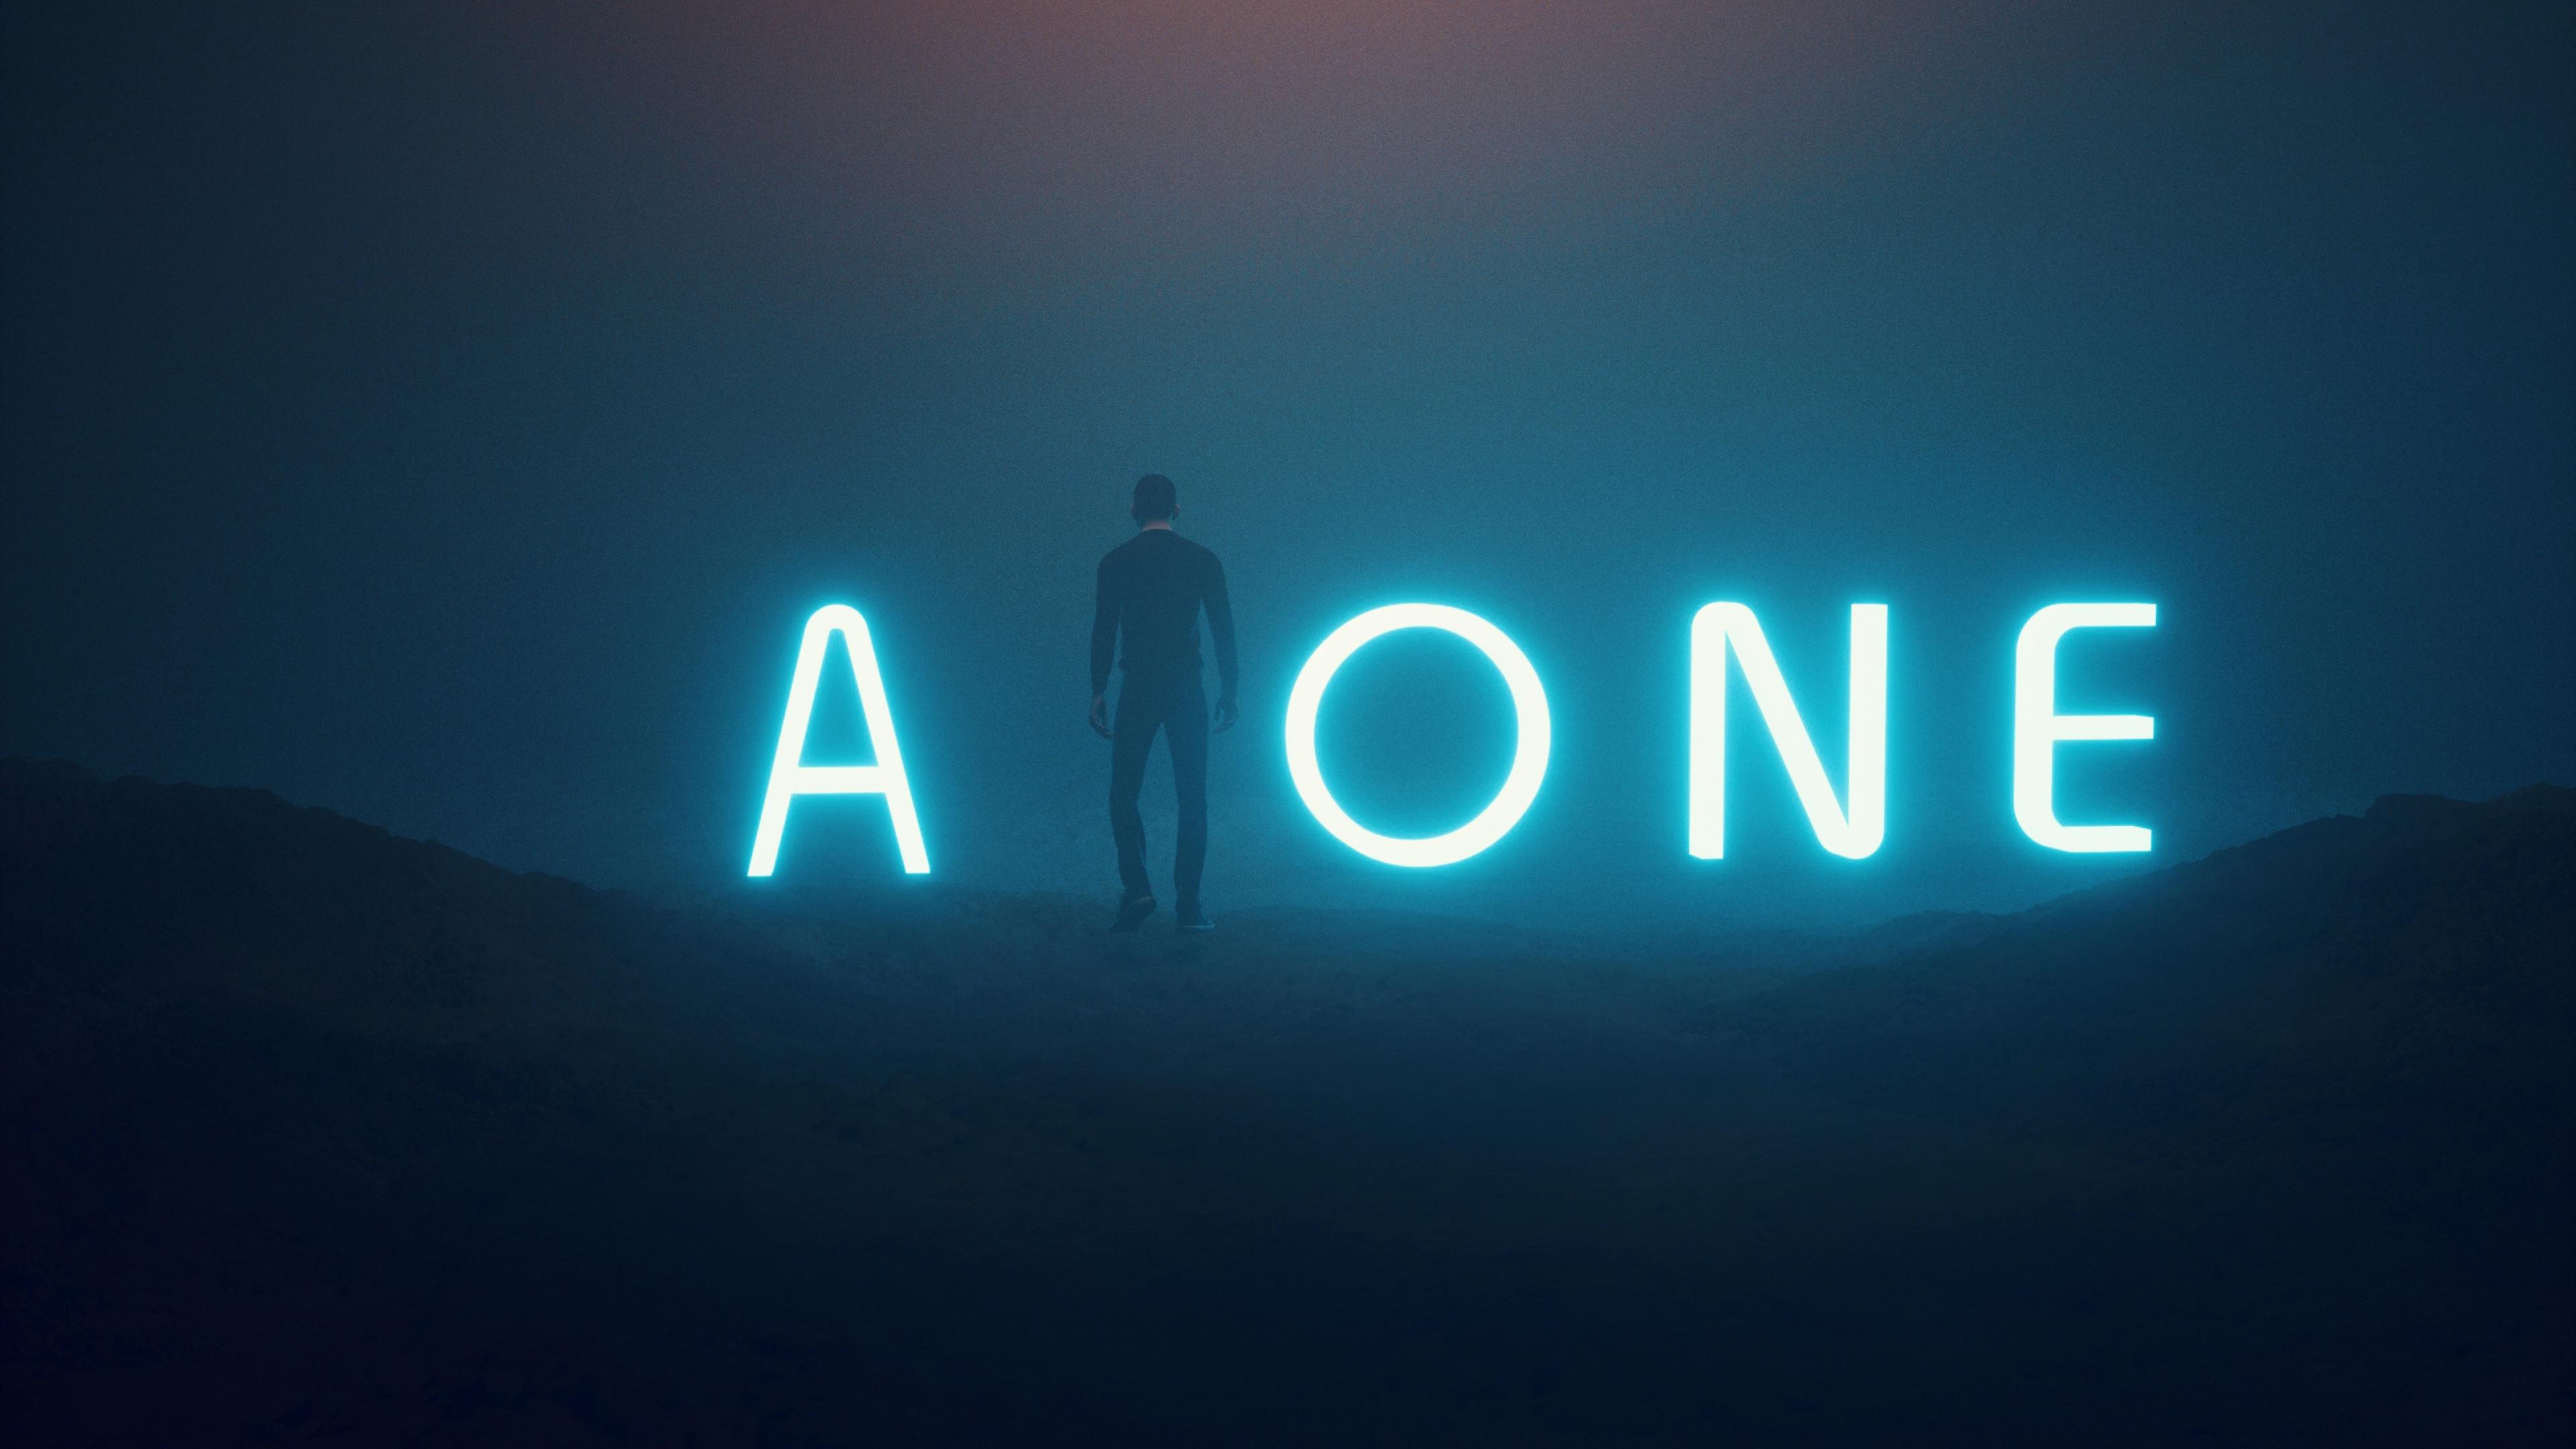 Alone 4k Wallpaper Neon Neon Typography Dark Fantasy 1077